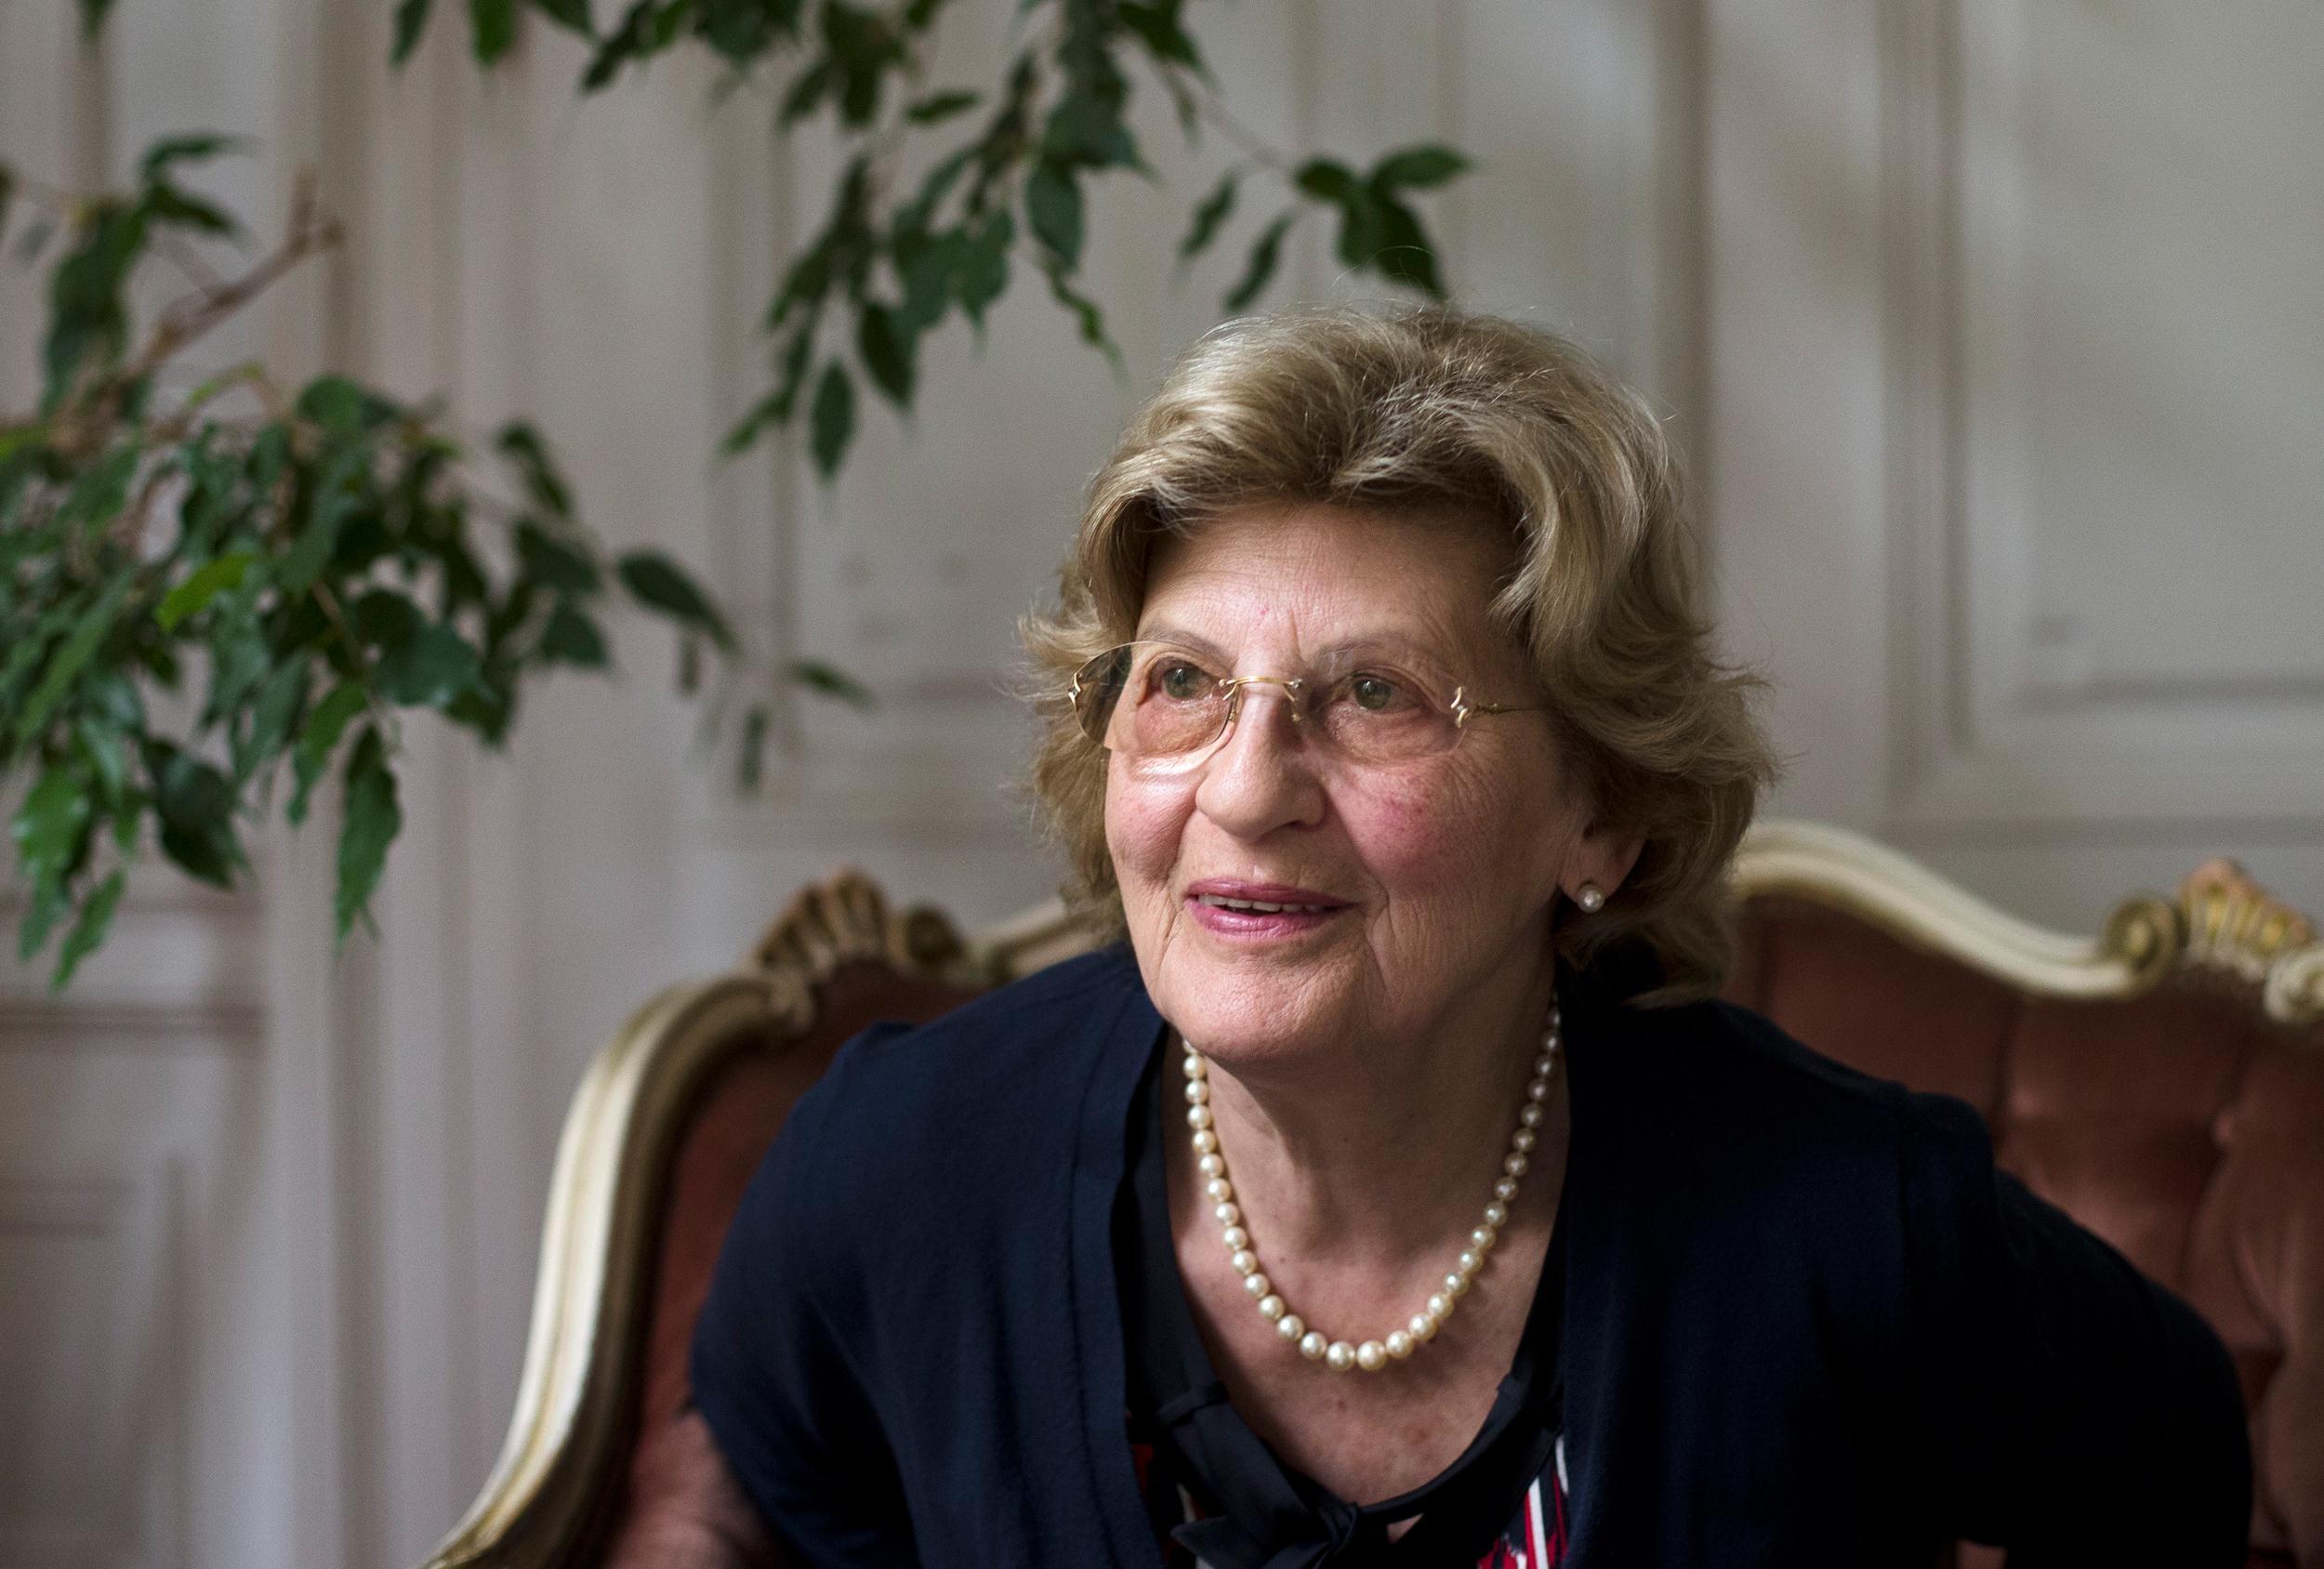 Image: Eva Szepesi